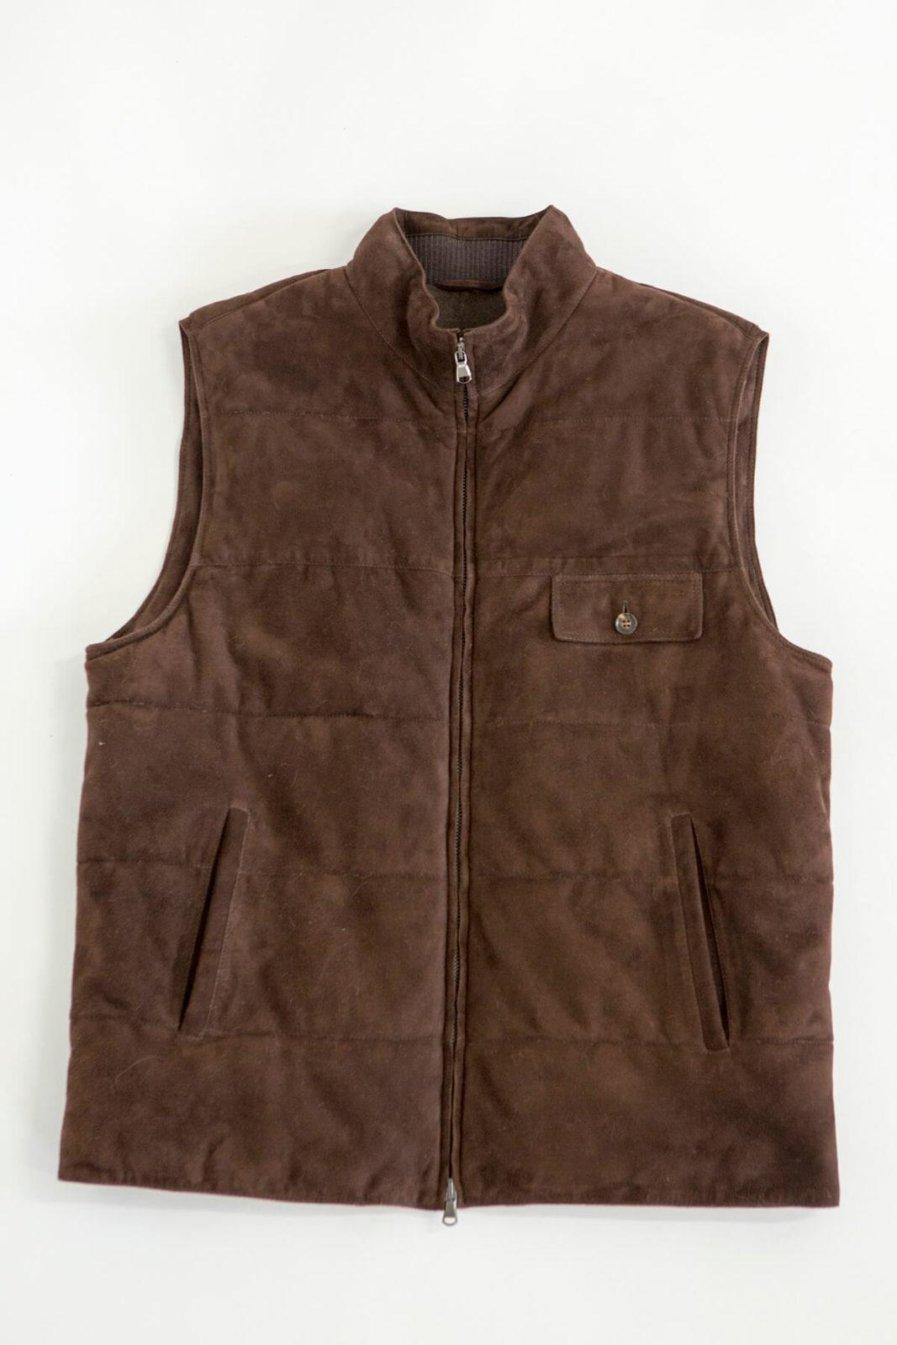 [:en]CHIE IMAI Lambskin Vest[:ja]CHIE IMAI ラムスキンベスト[:]